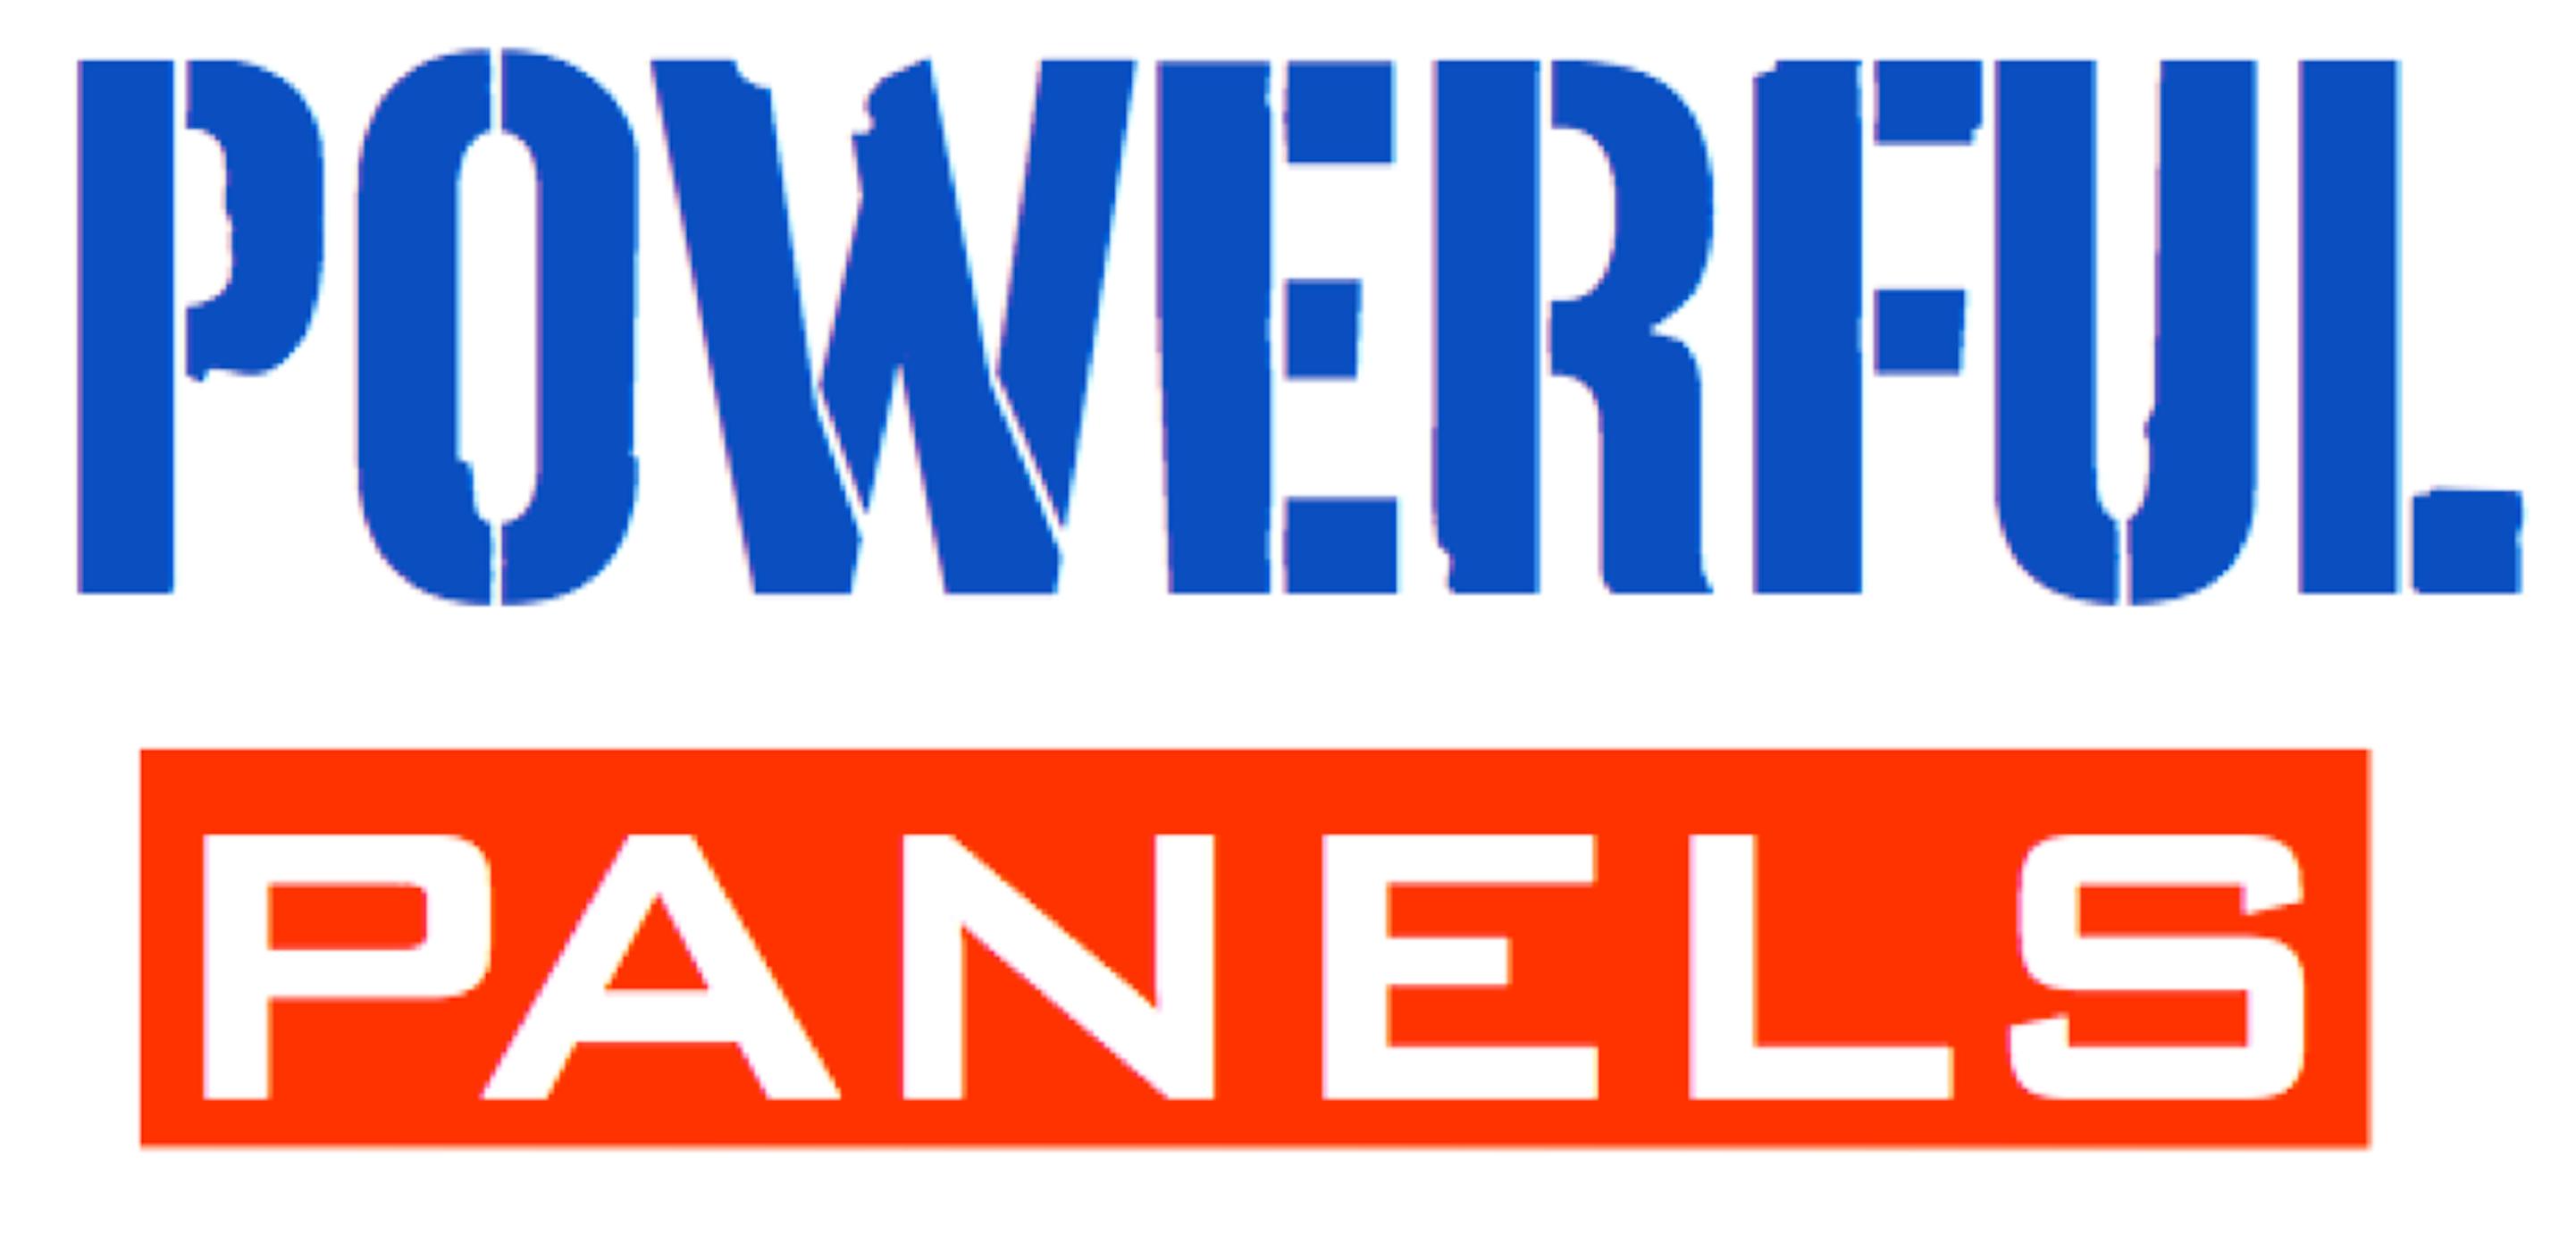 <![CDATA[Powerful Panels]]>